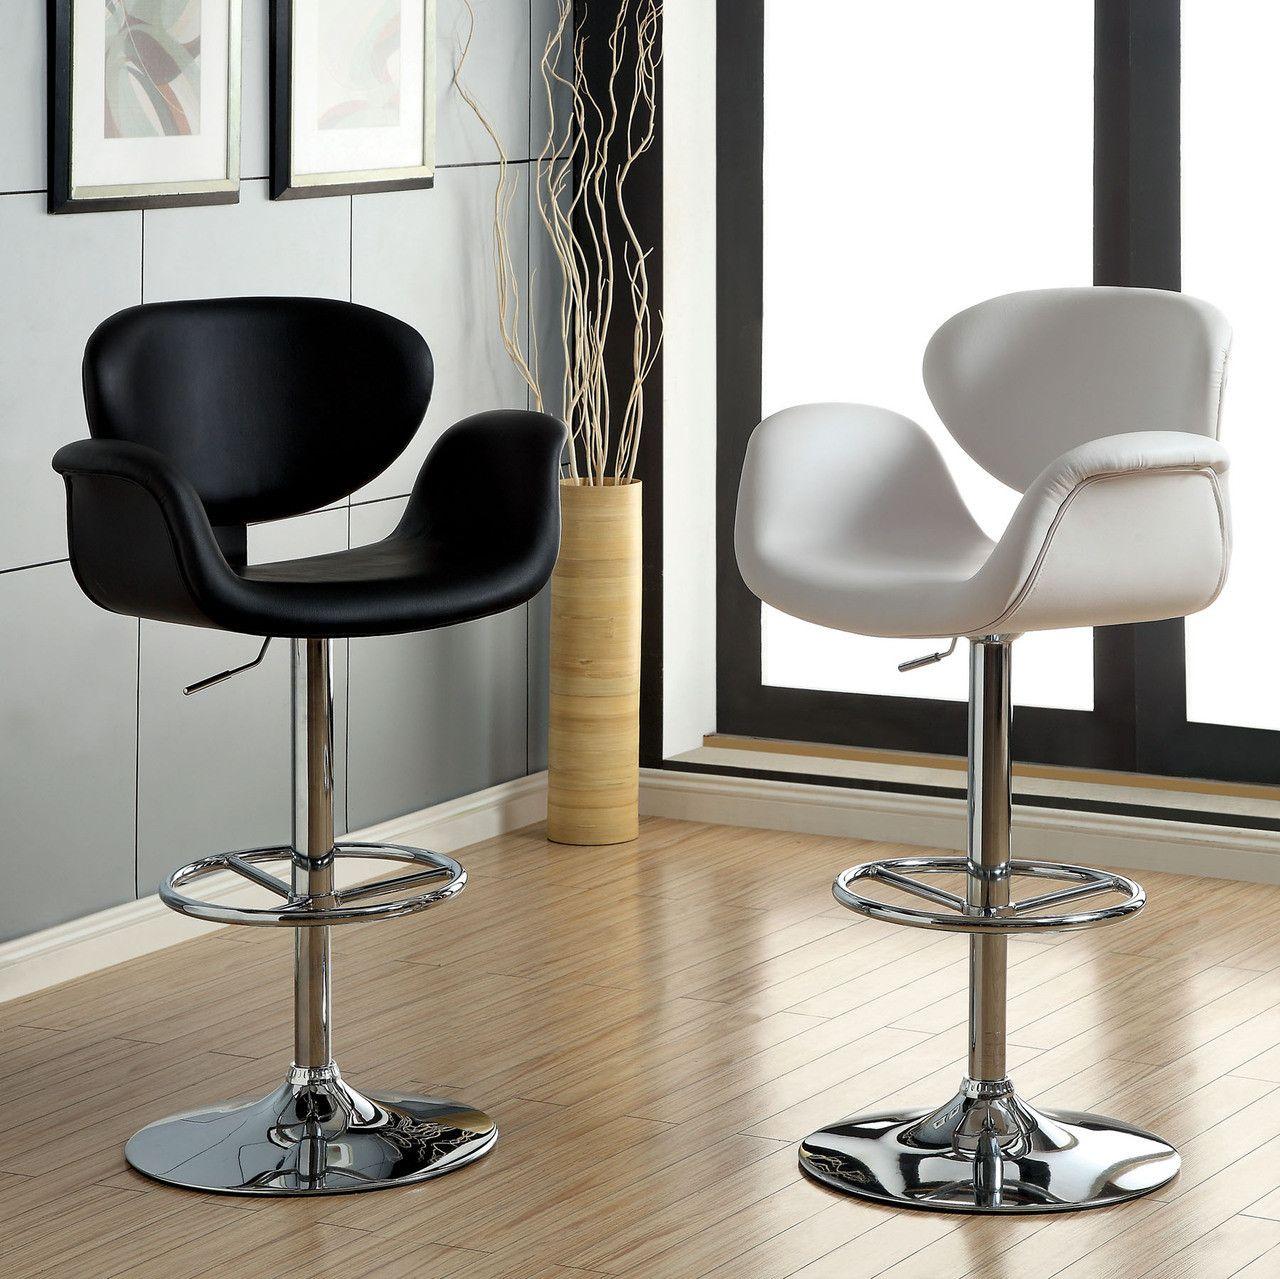 Furniture Of America Height Adjustable Bar Stool -Br6918Bk